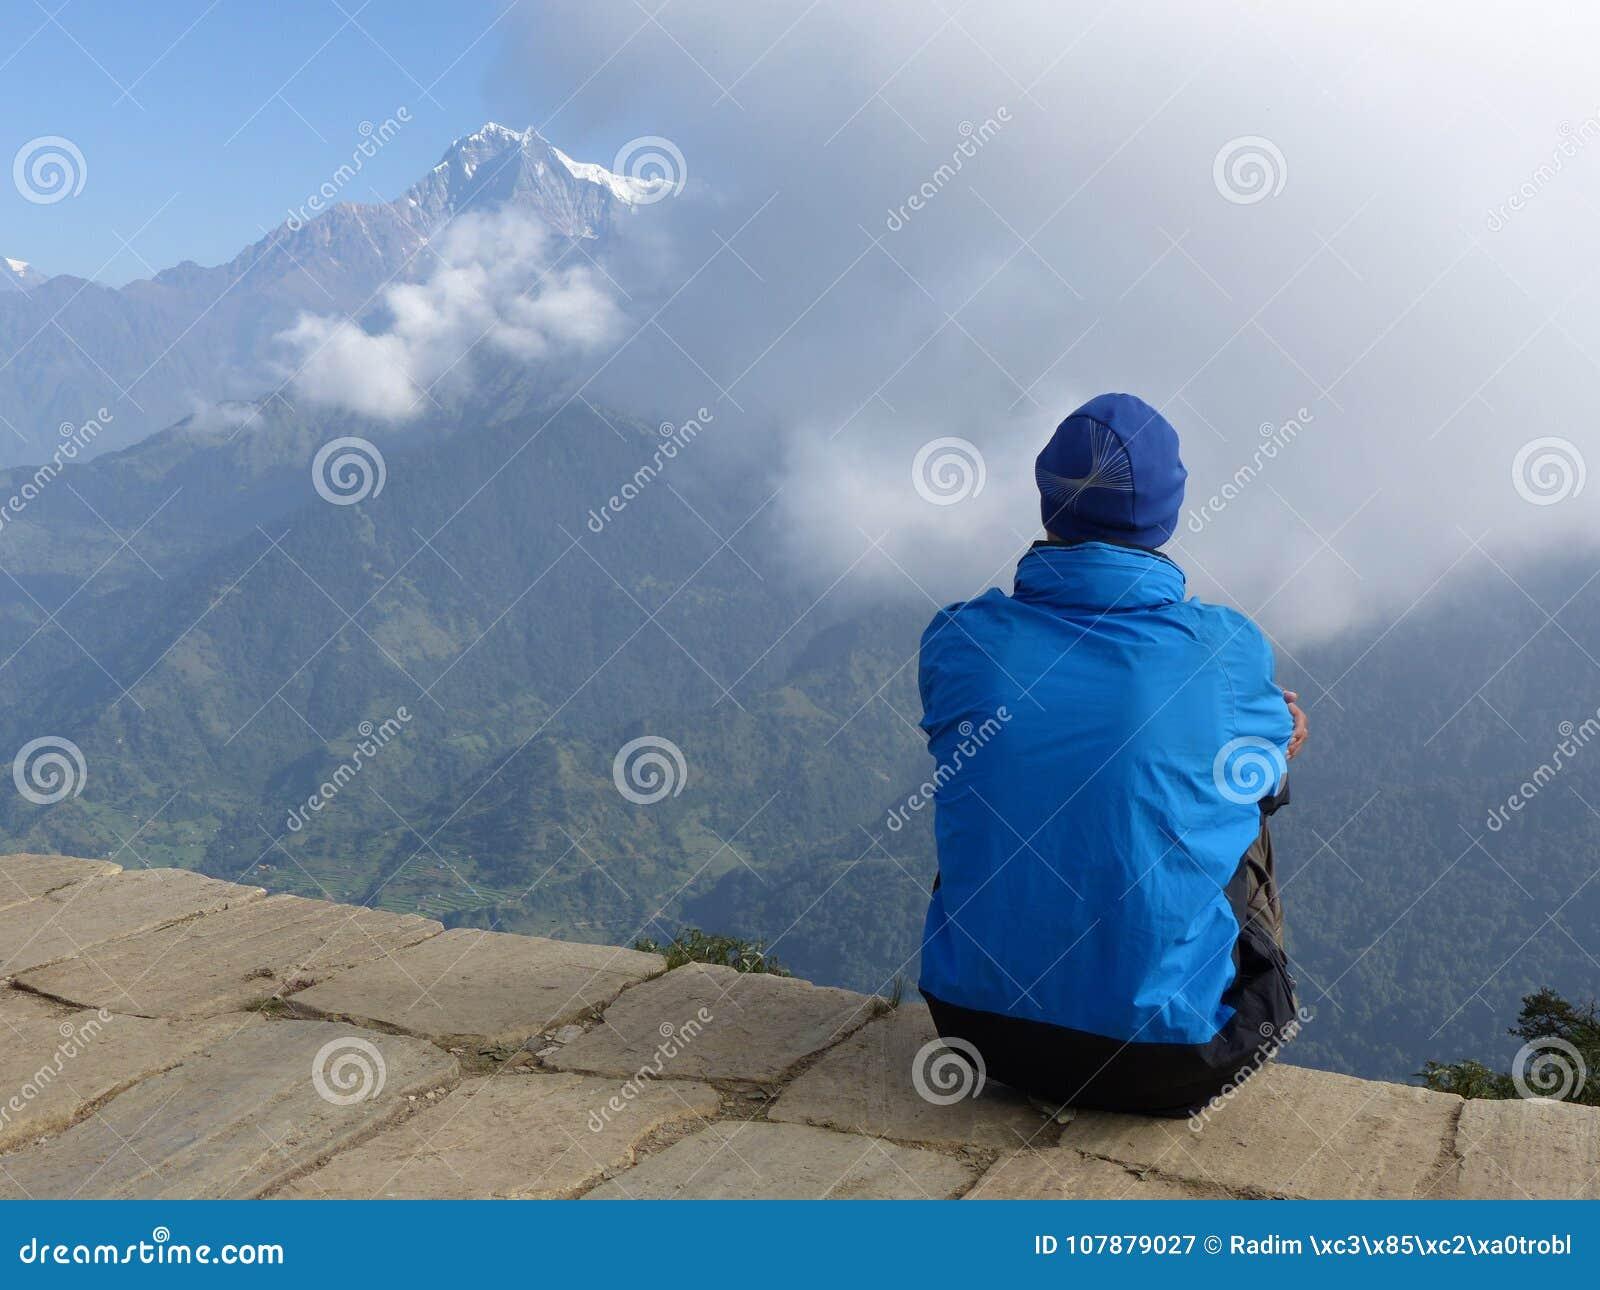 Hiker looking to the mountain on Poon Hill, Dhaulagiri range, Ne